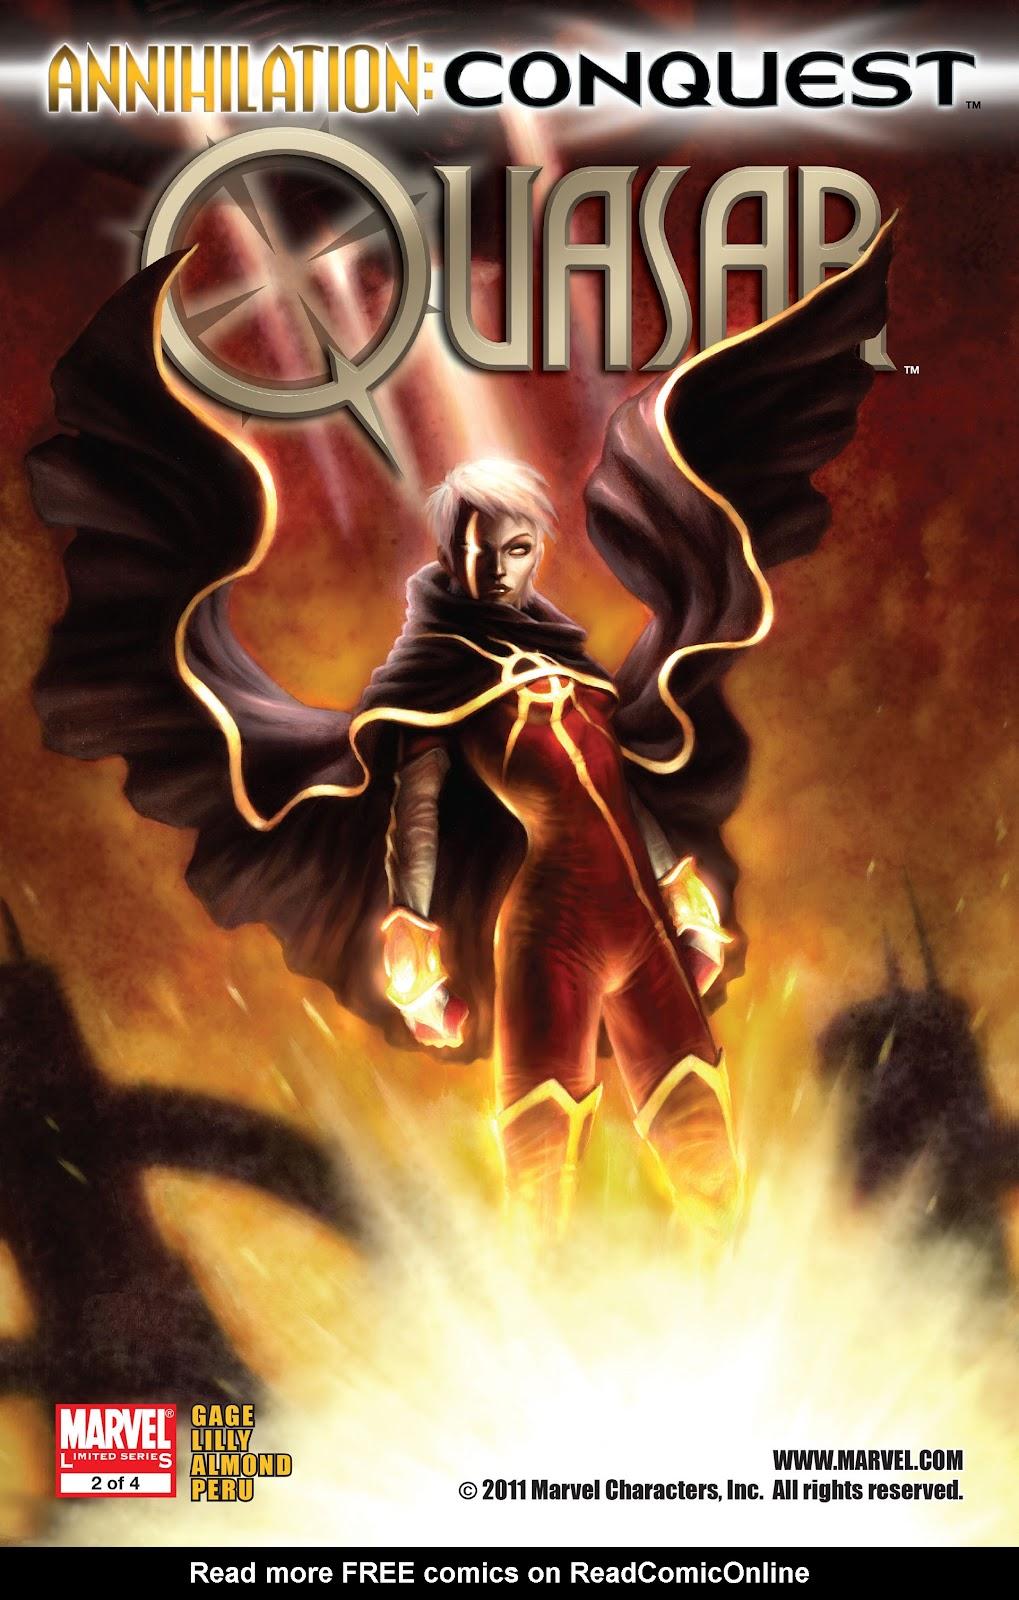 Annihilation: Conquest - Quasar issue 2 - Page 1